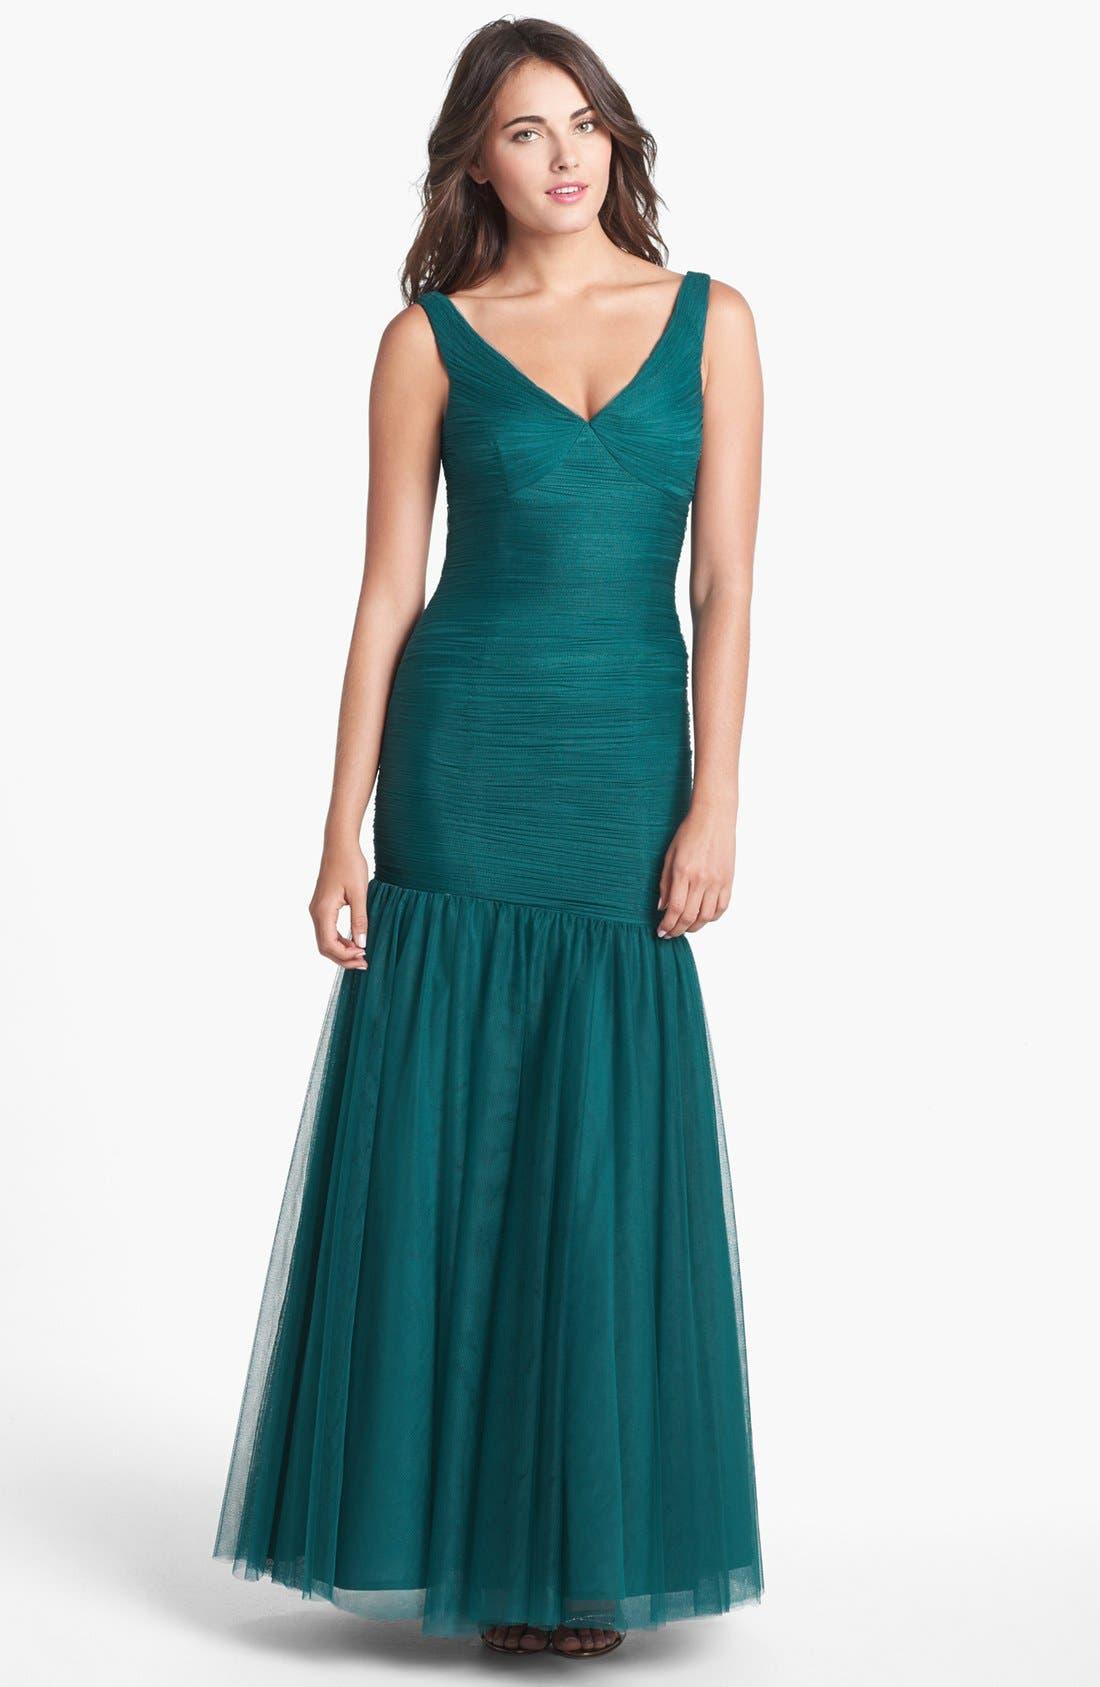 Alternate Image 1 Selected - Monique Lhuillier Bridesmaids V-Neck Shirred Tulle Trumpet Dress